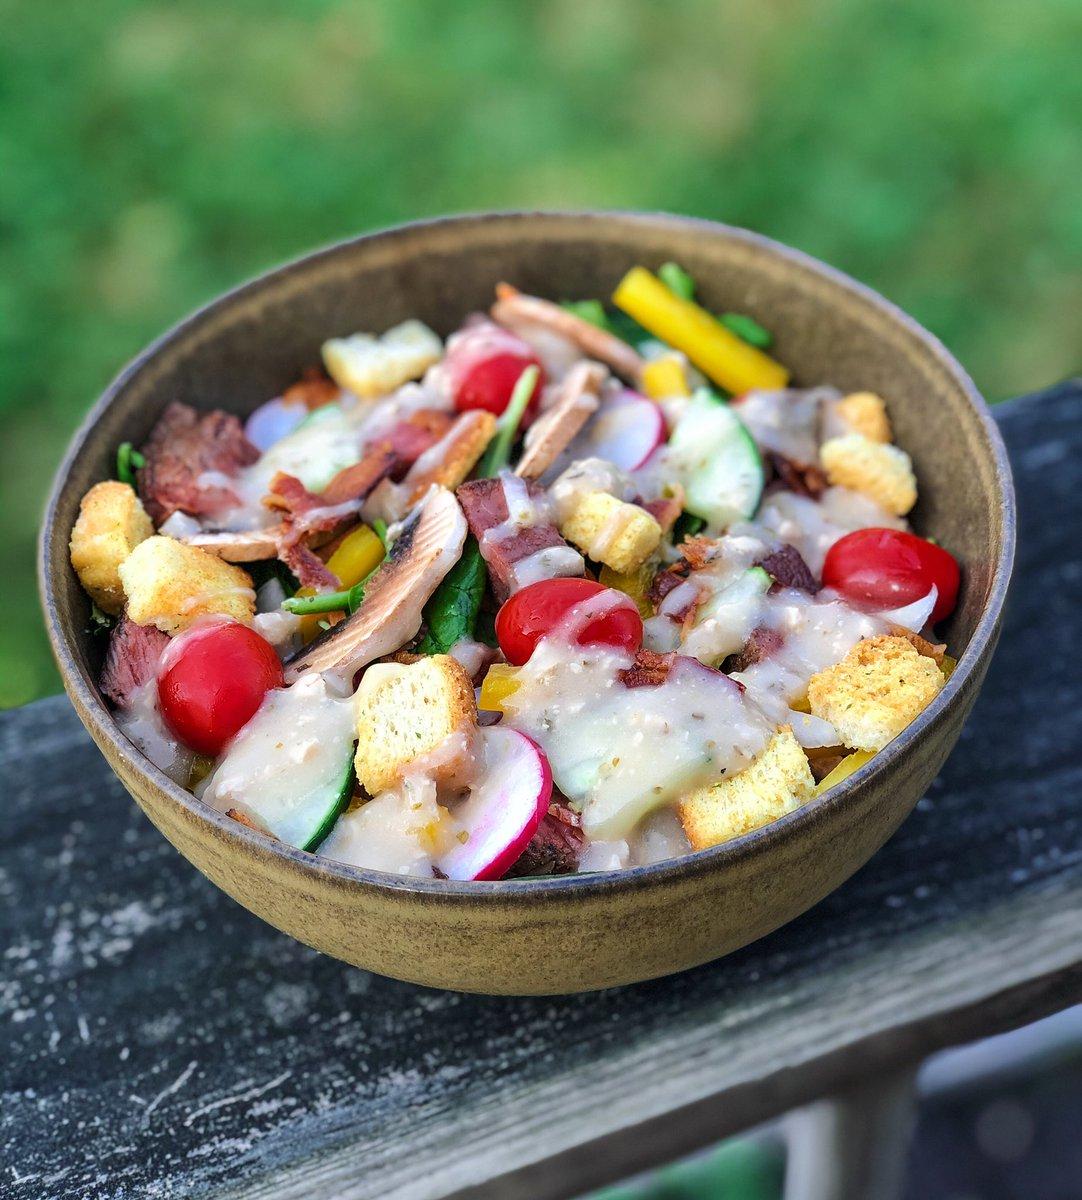 steak salad w/ a blue cheese vin  solid summer eats. #eeeeeats pic.twitter.com/TGfwWcVlKX